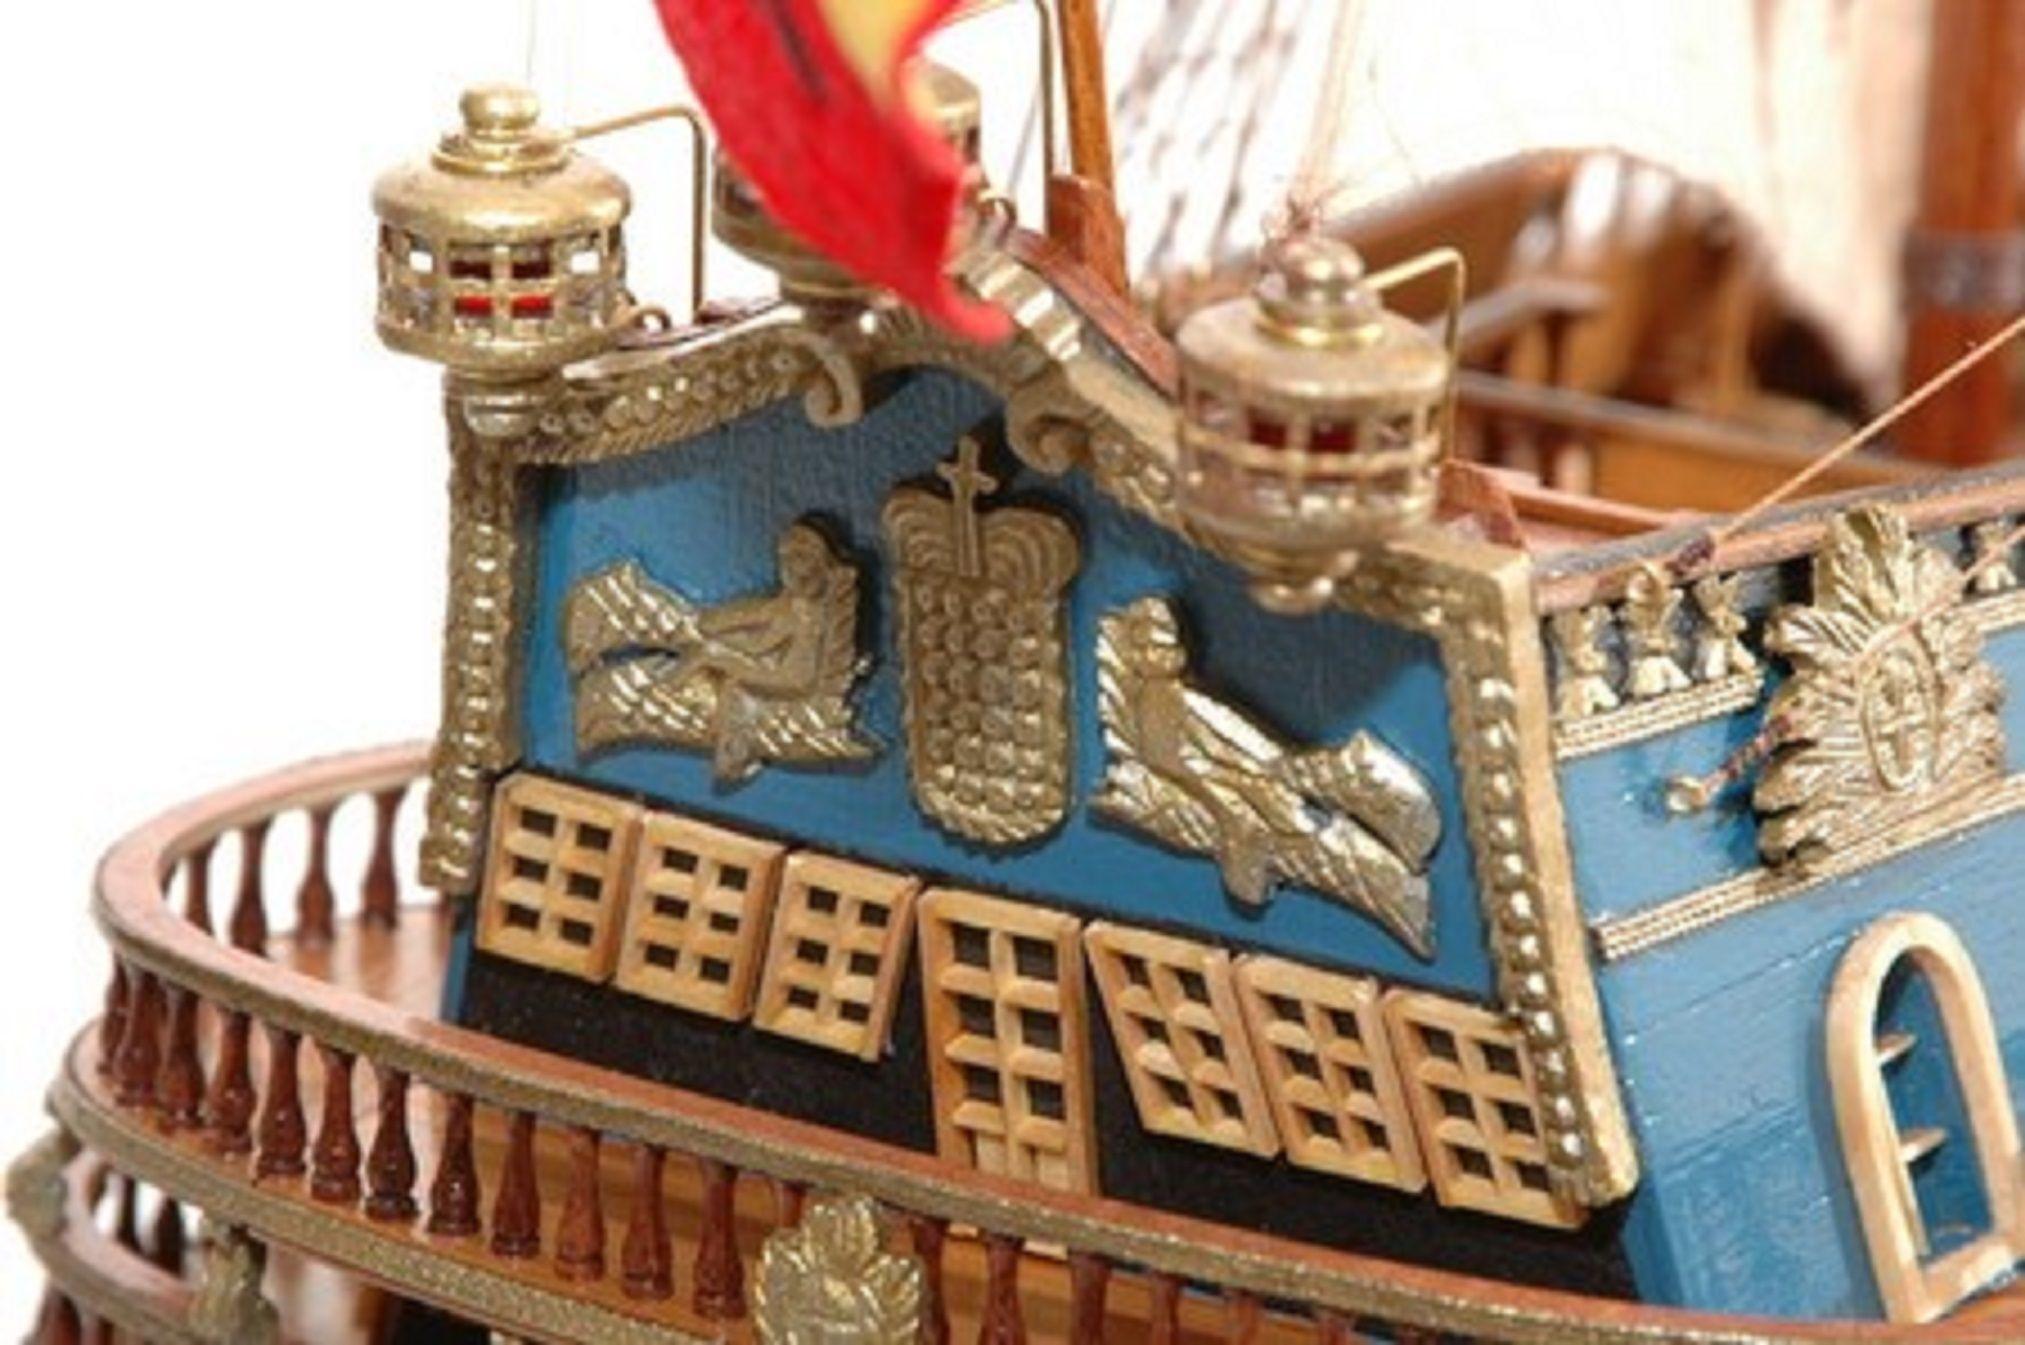 1418-7604-San-Felipe-model-ship-Extra-Large-Premier-Range